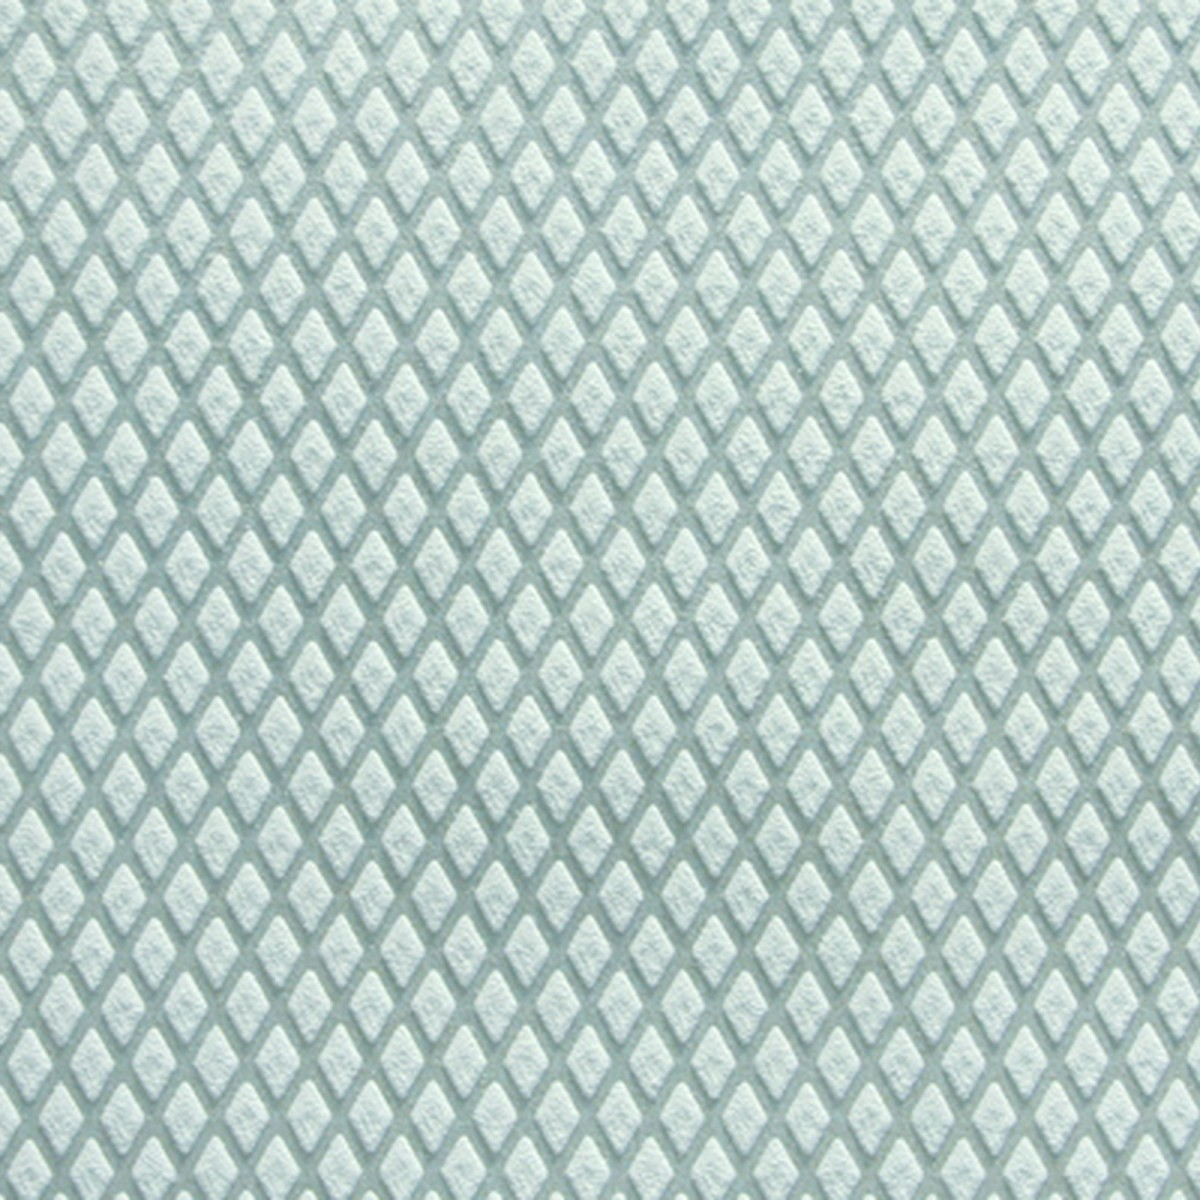 Обои на флизелиновой основе 1.06х10 м фон бирюзовый Эл Е74401